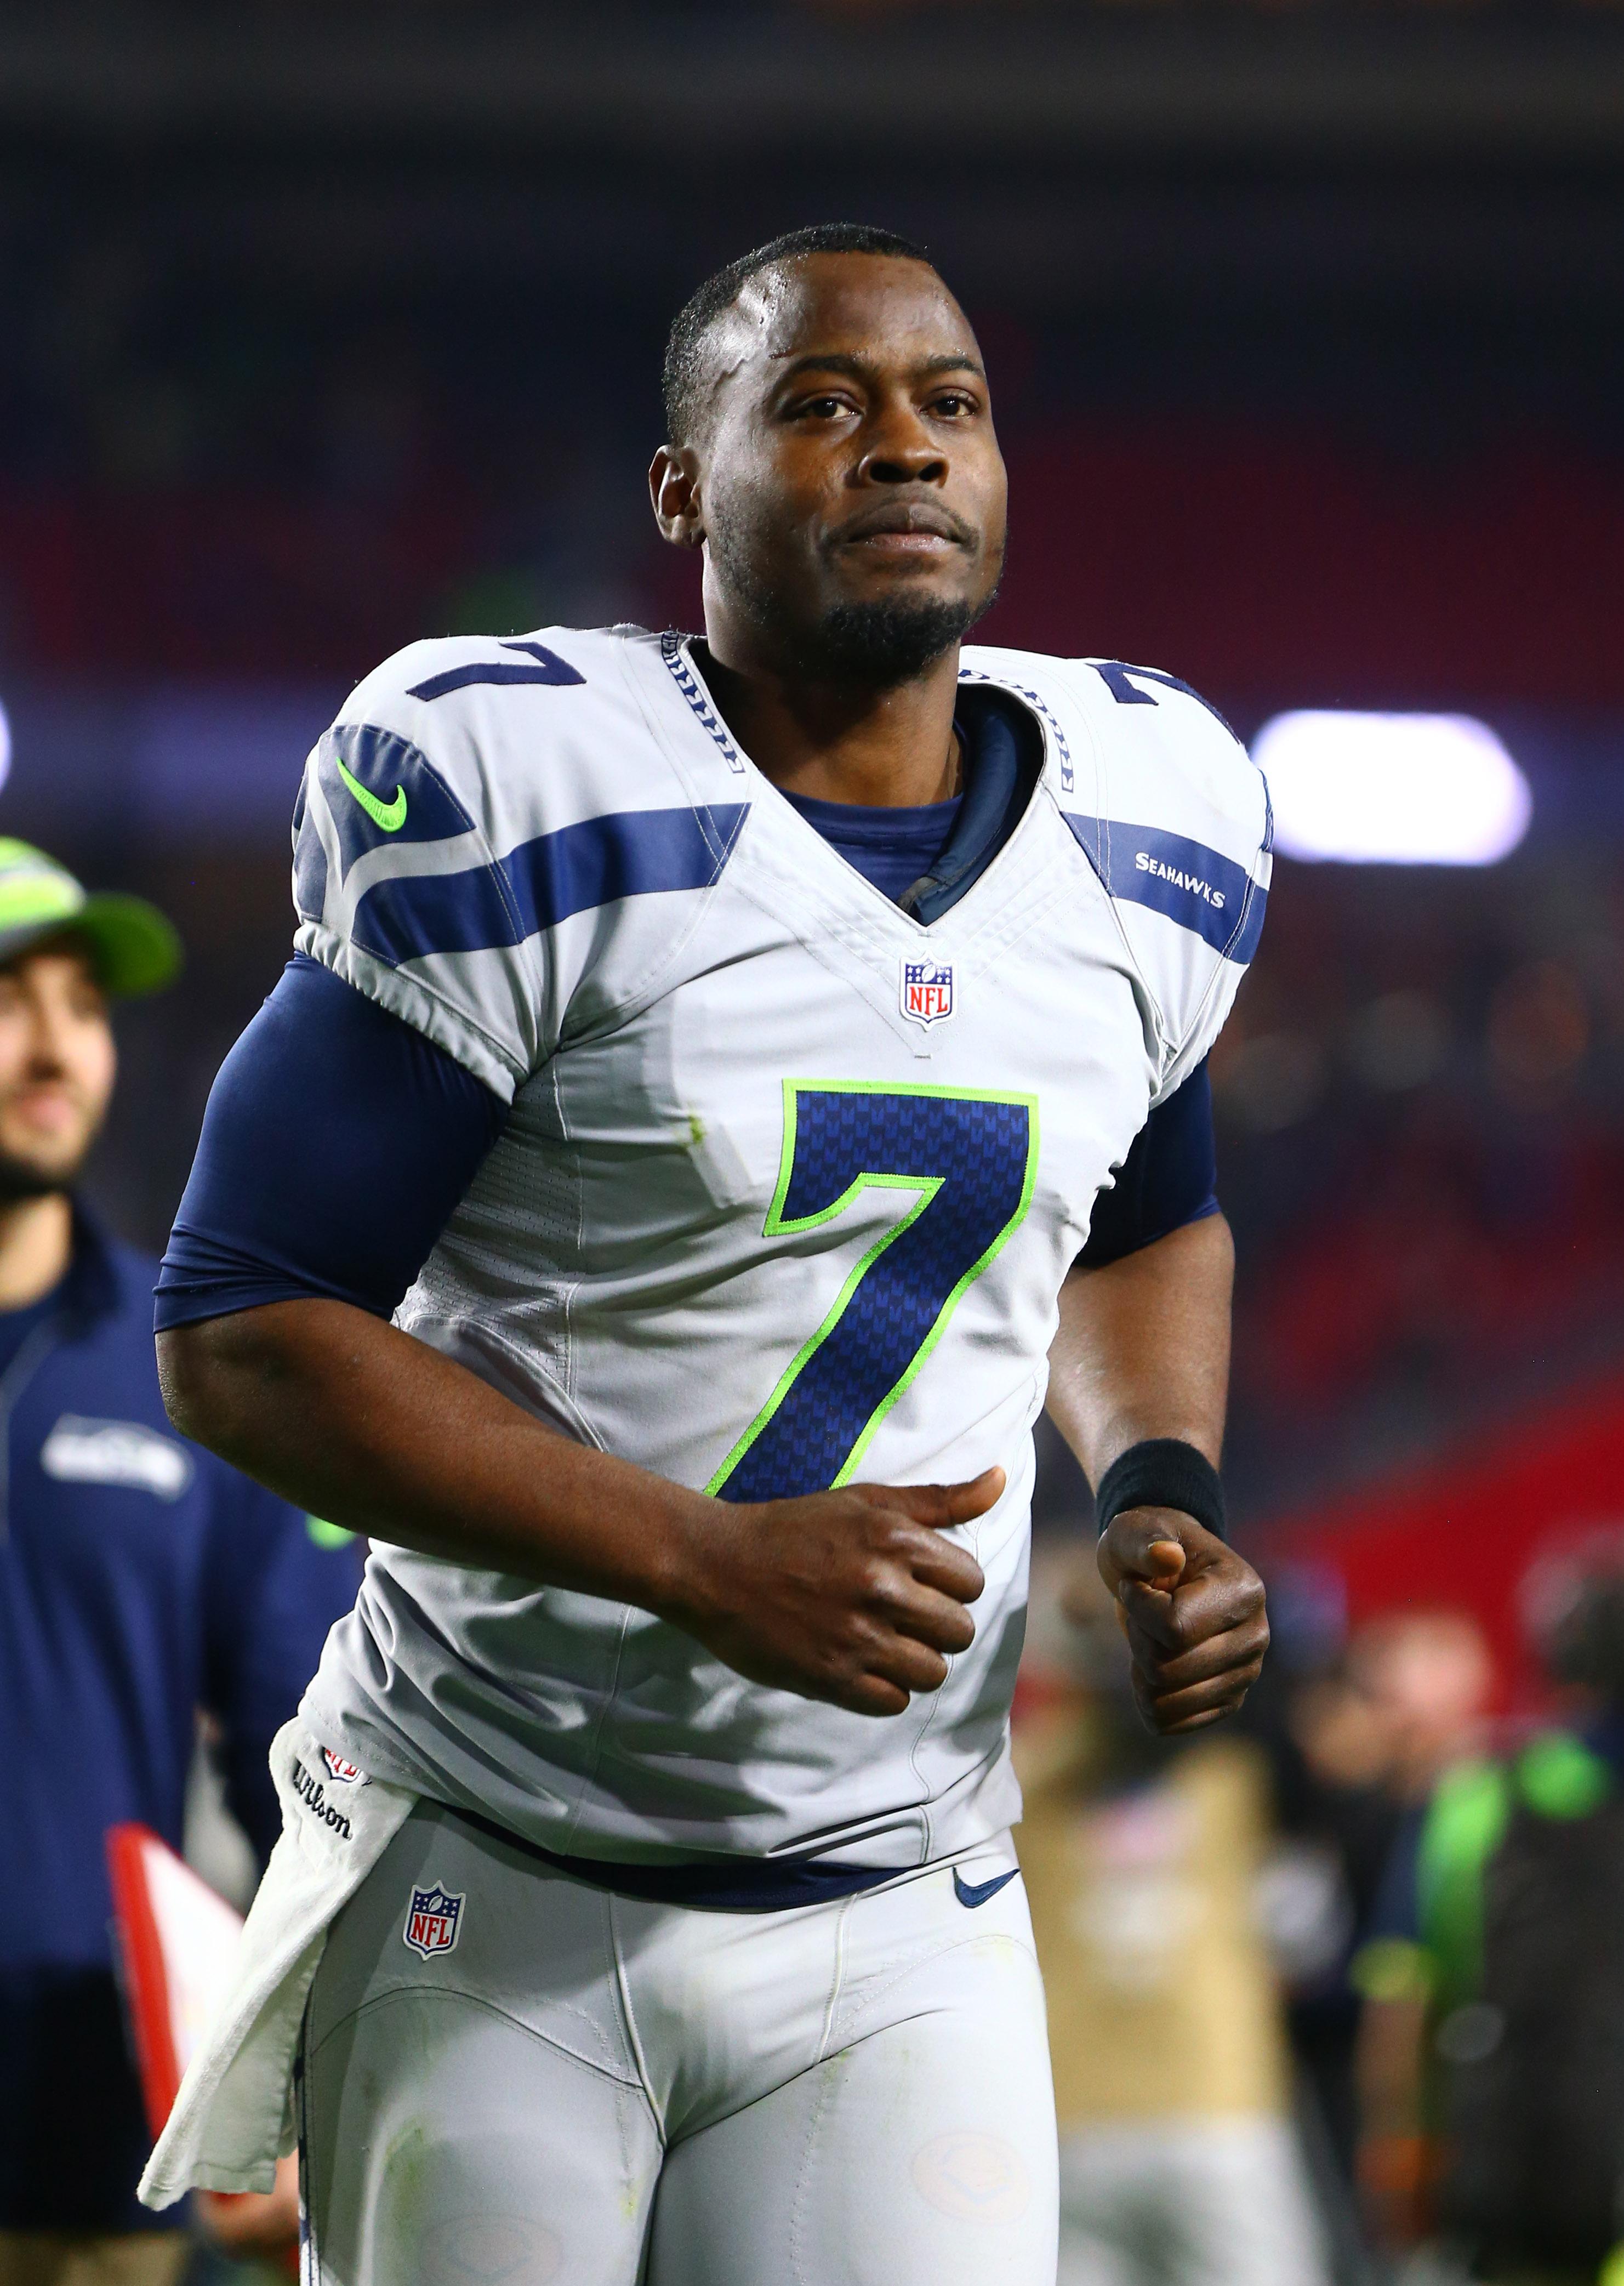 Former NFL QB Tarvaris Jackson Passes Away